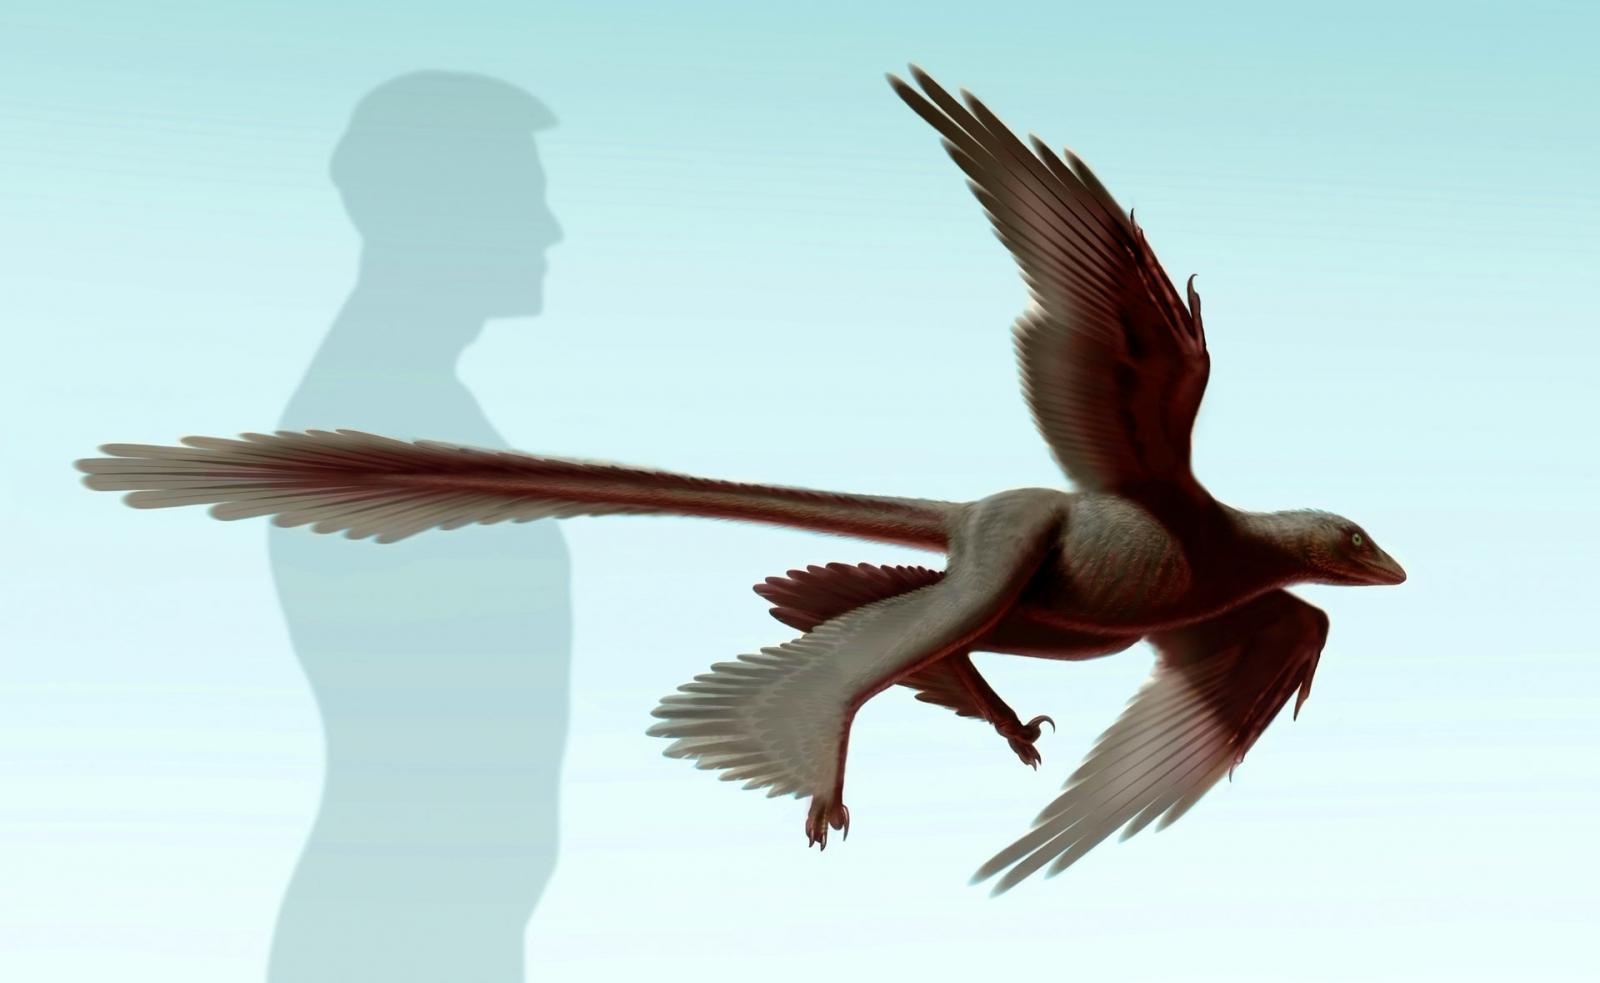 Changyuraptor yangi